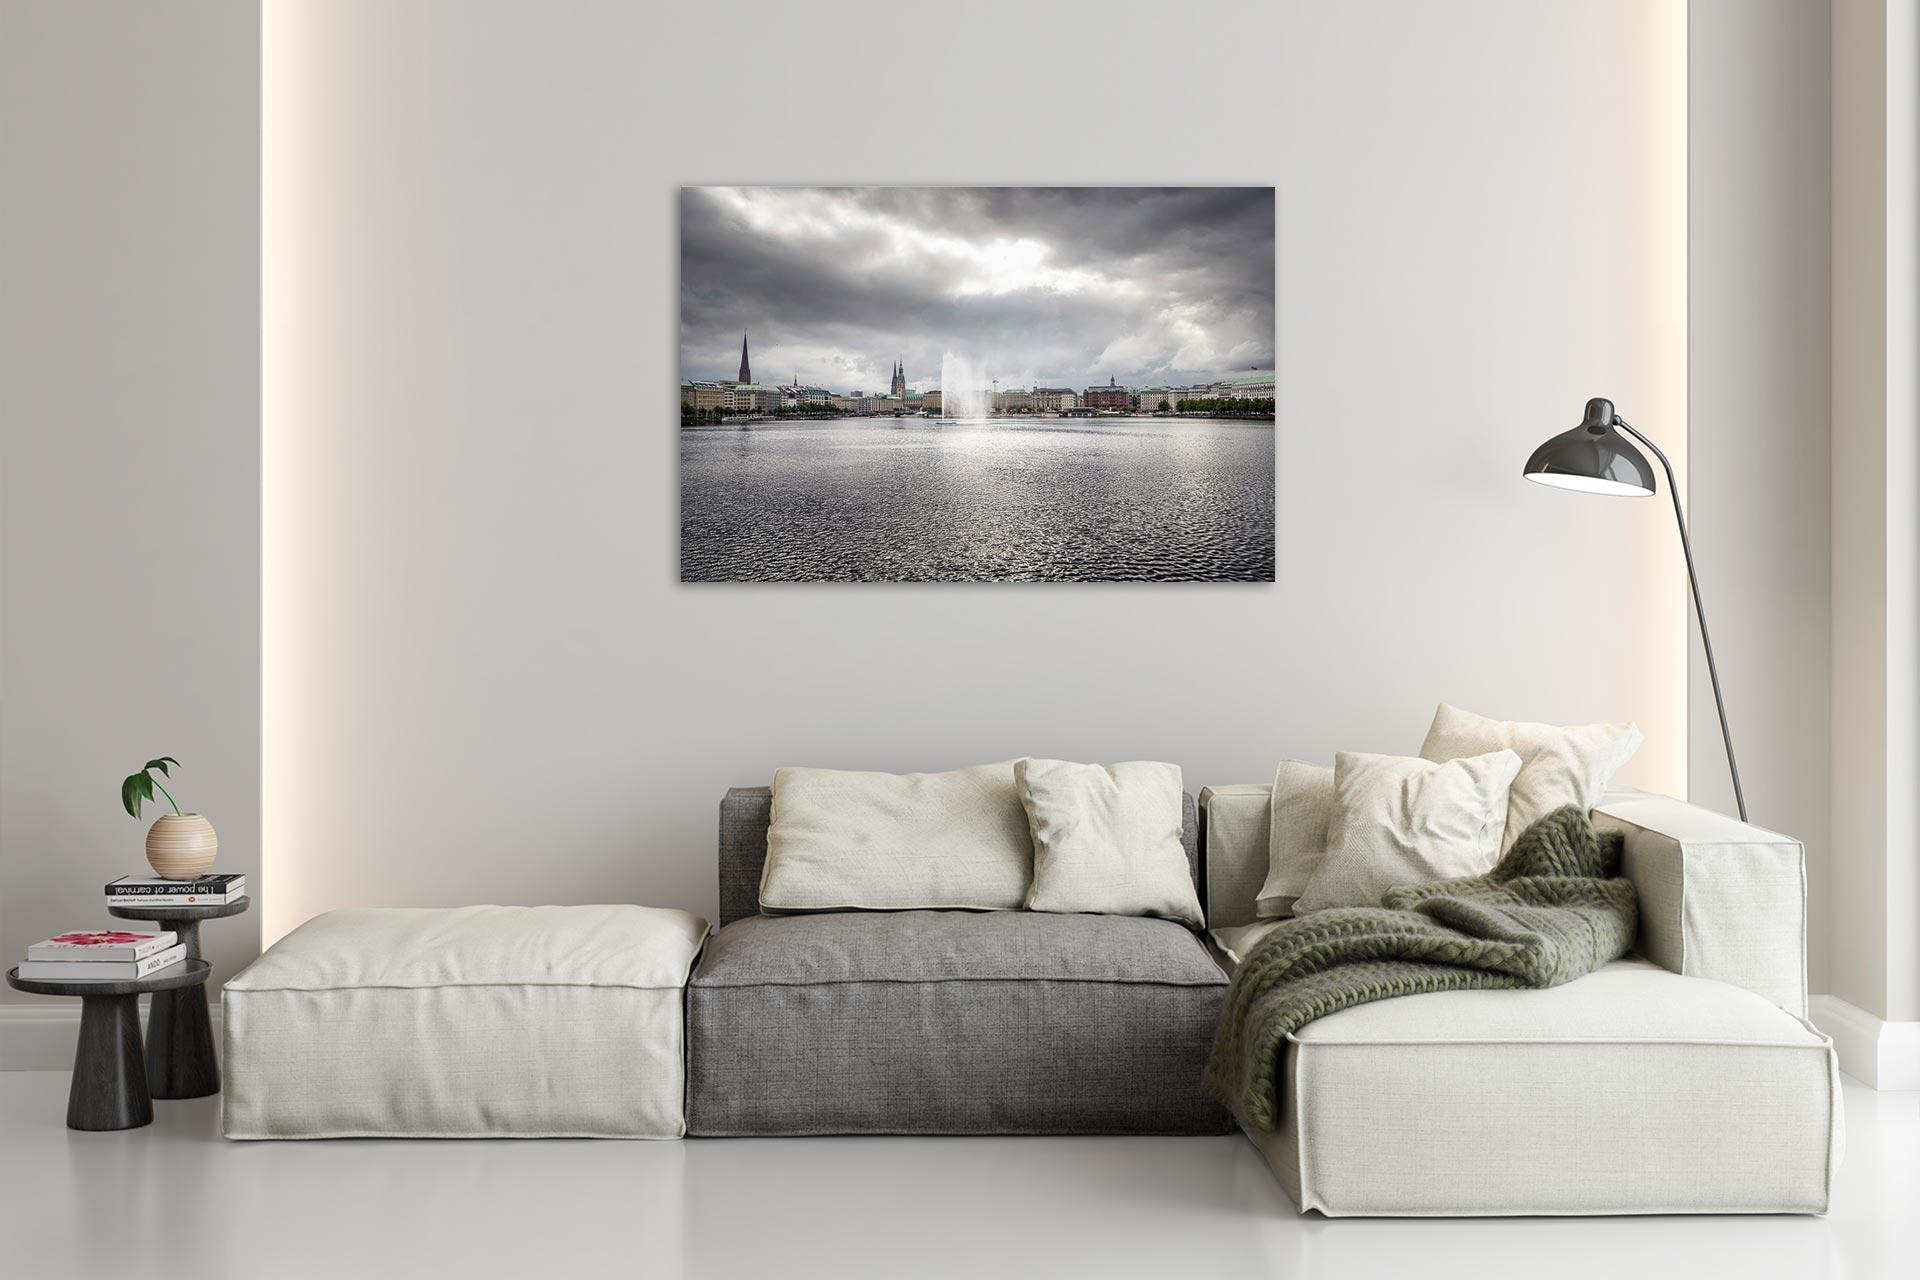 TG616-silbrige-alster-wandbild-bild-auf-leinwand-acrylglas-aludibond-wohnzimmer